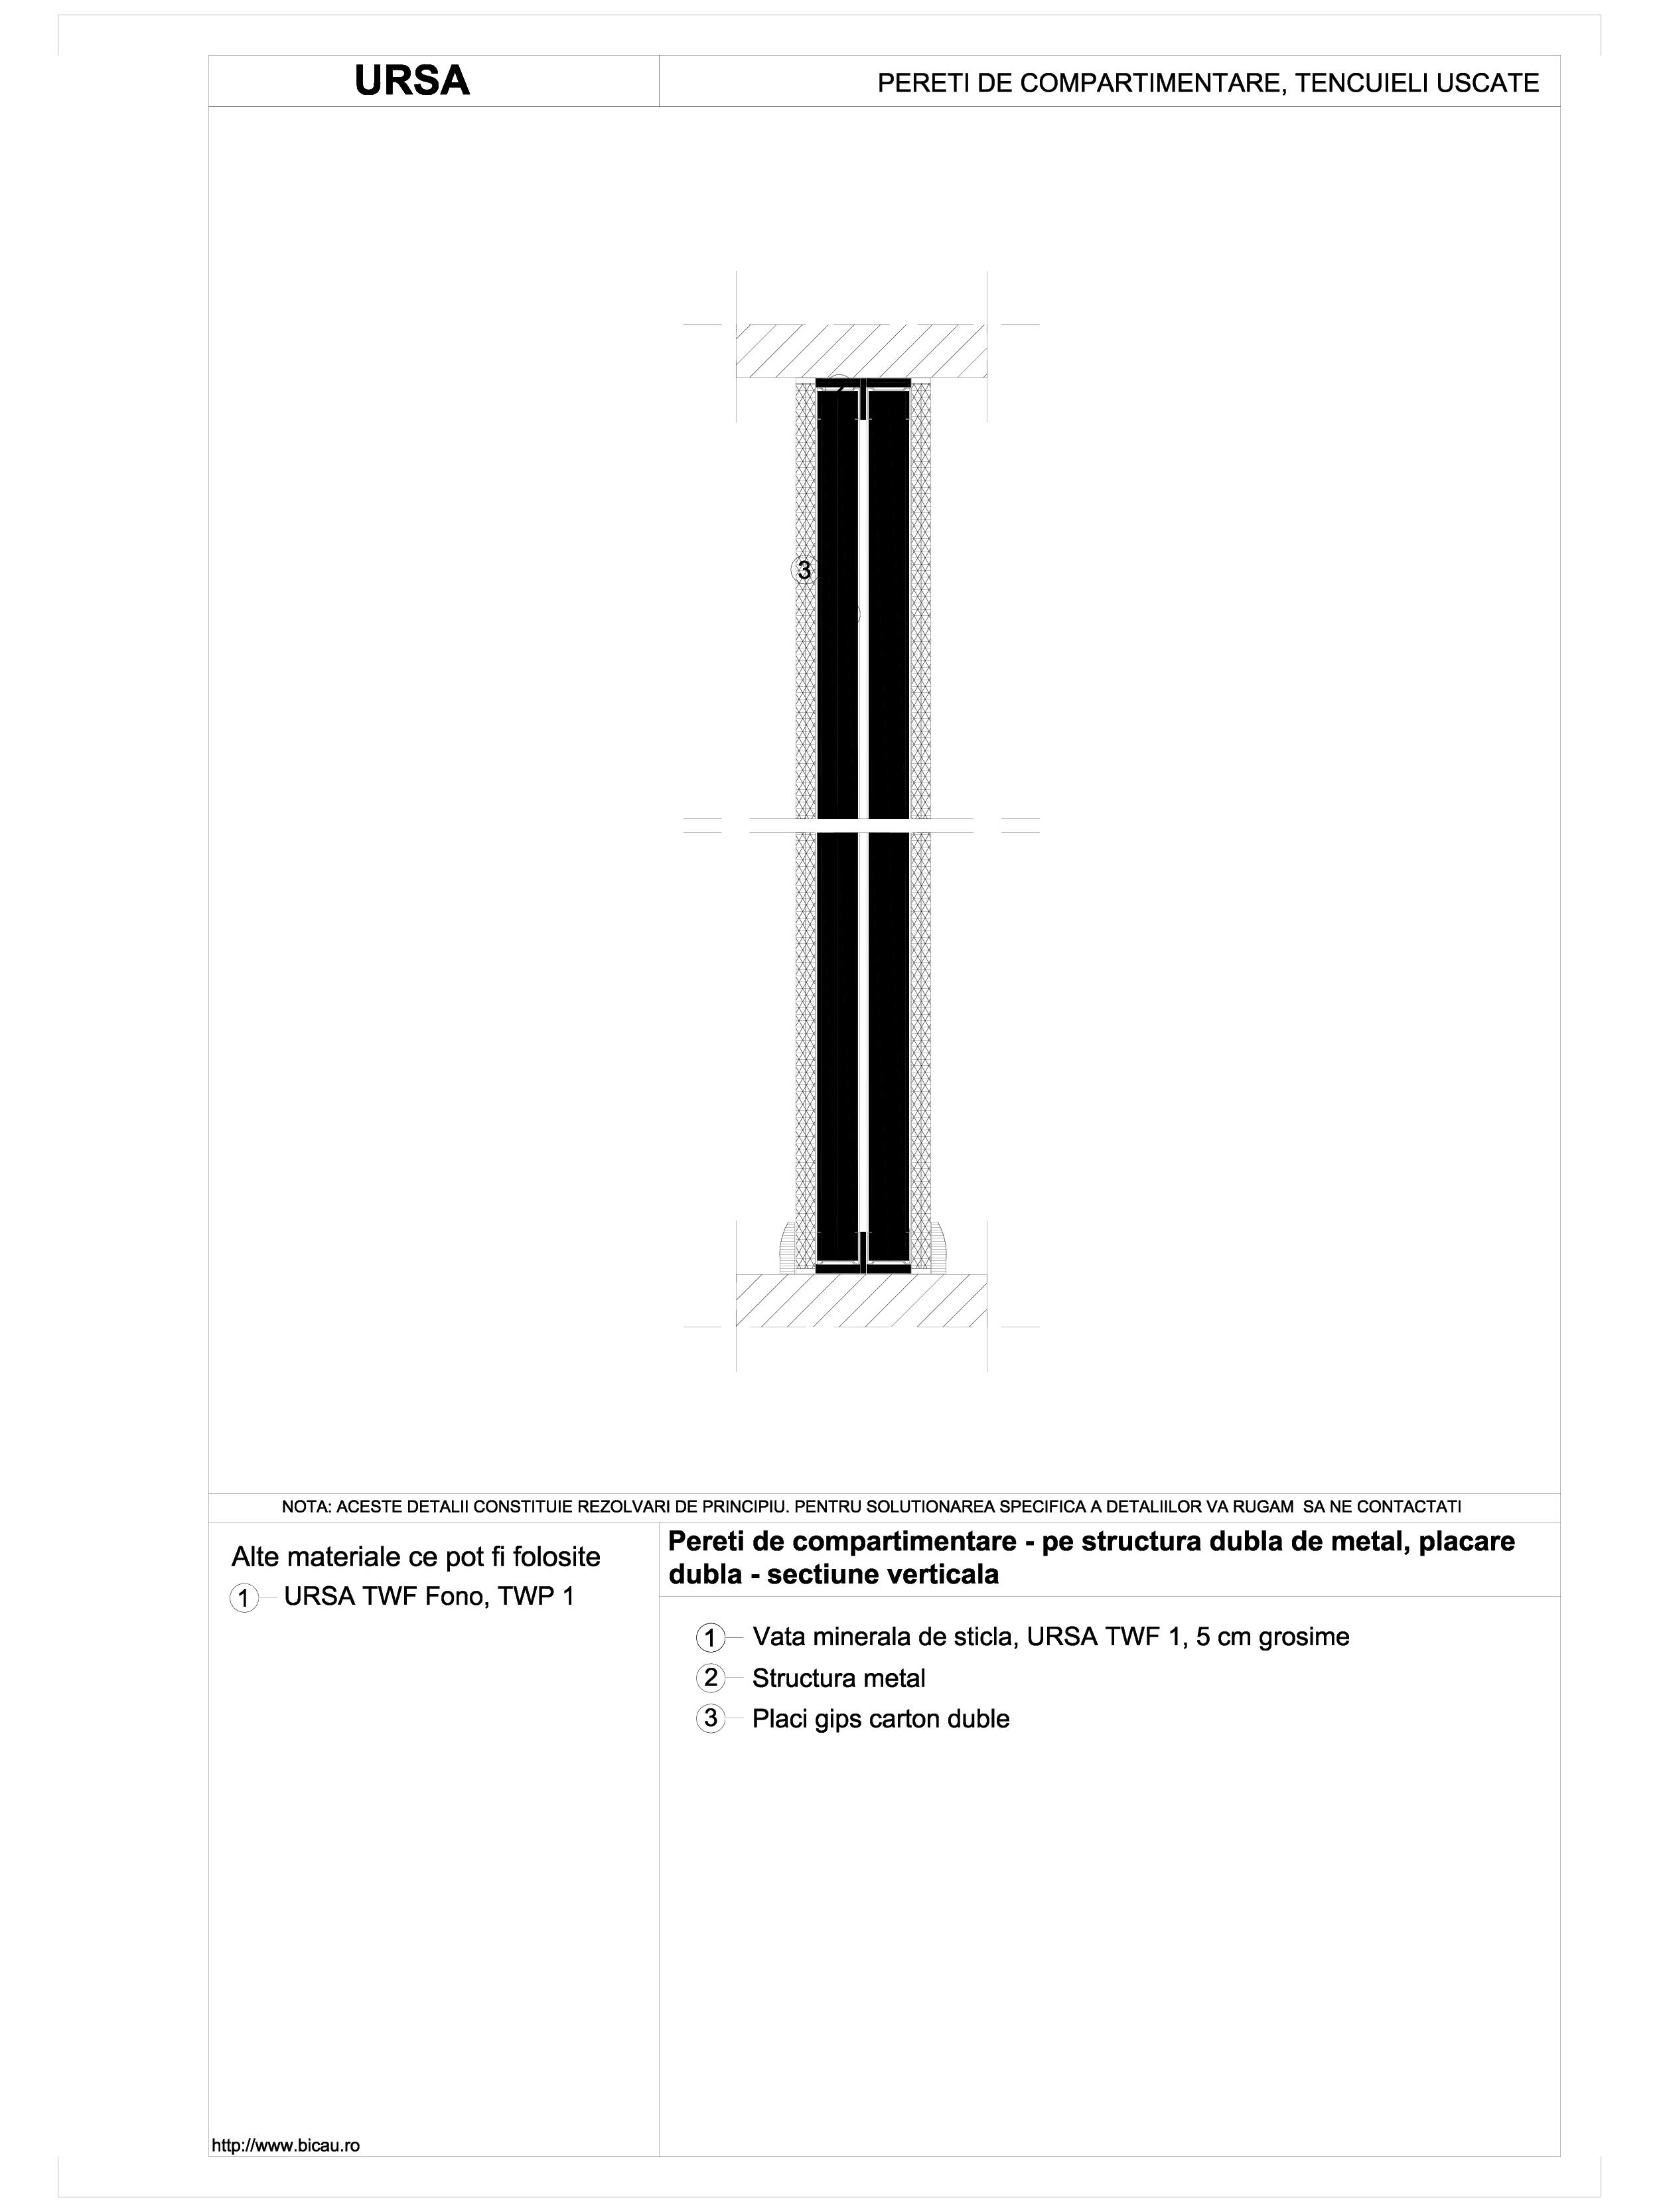 Pereti de compartimentare - pe structura dubla de metal, placare dubla - sectiune verticala TWF FONO URSA Vata minerala pentru pereti de compartimentare URSA ROMANIA   - Pagina 1